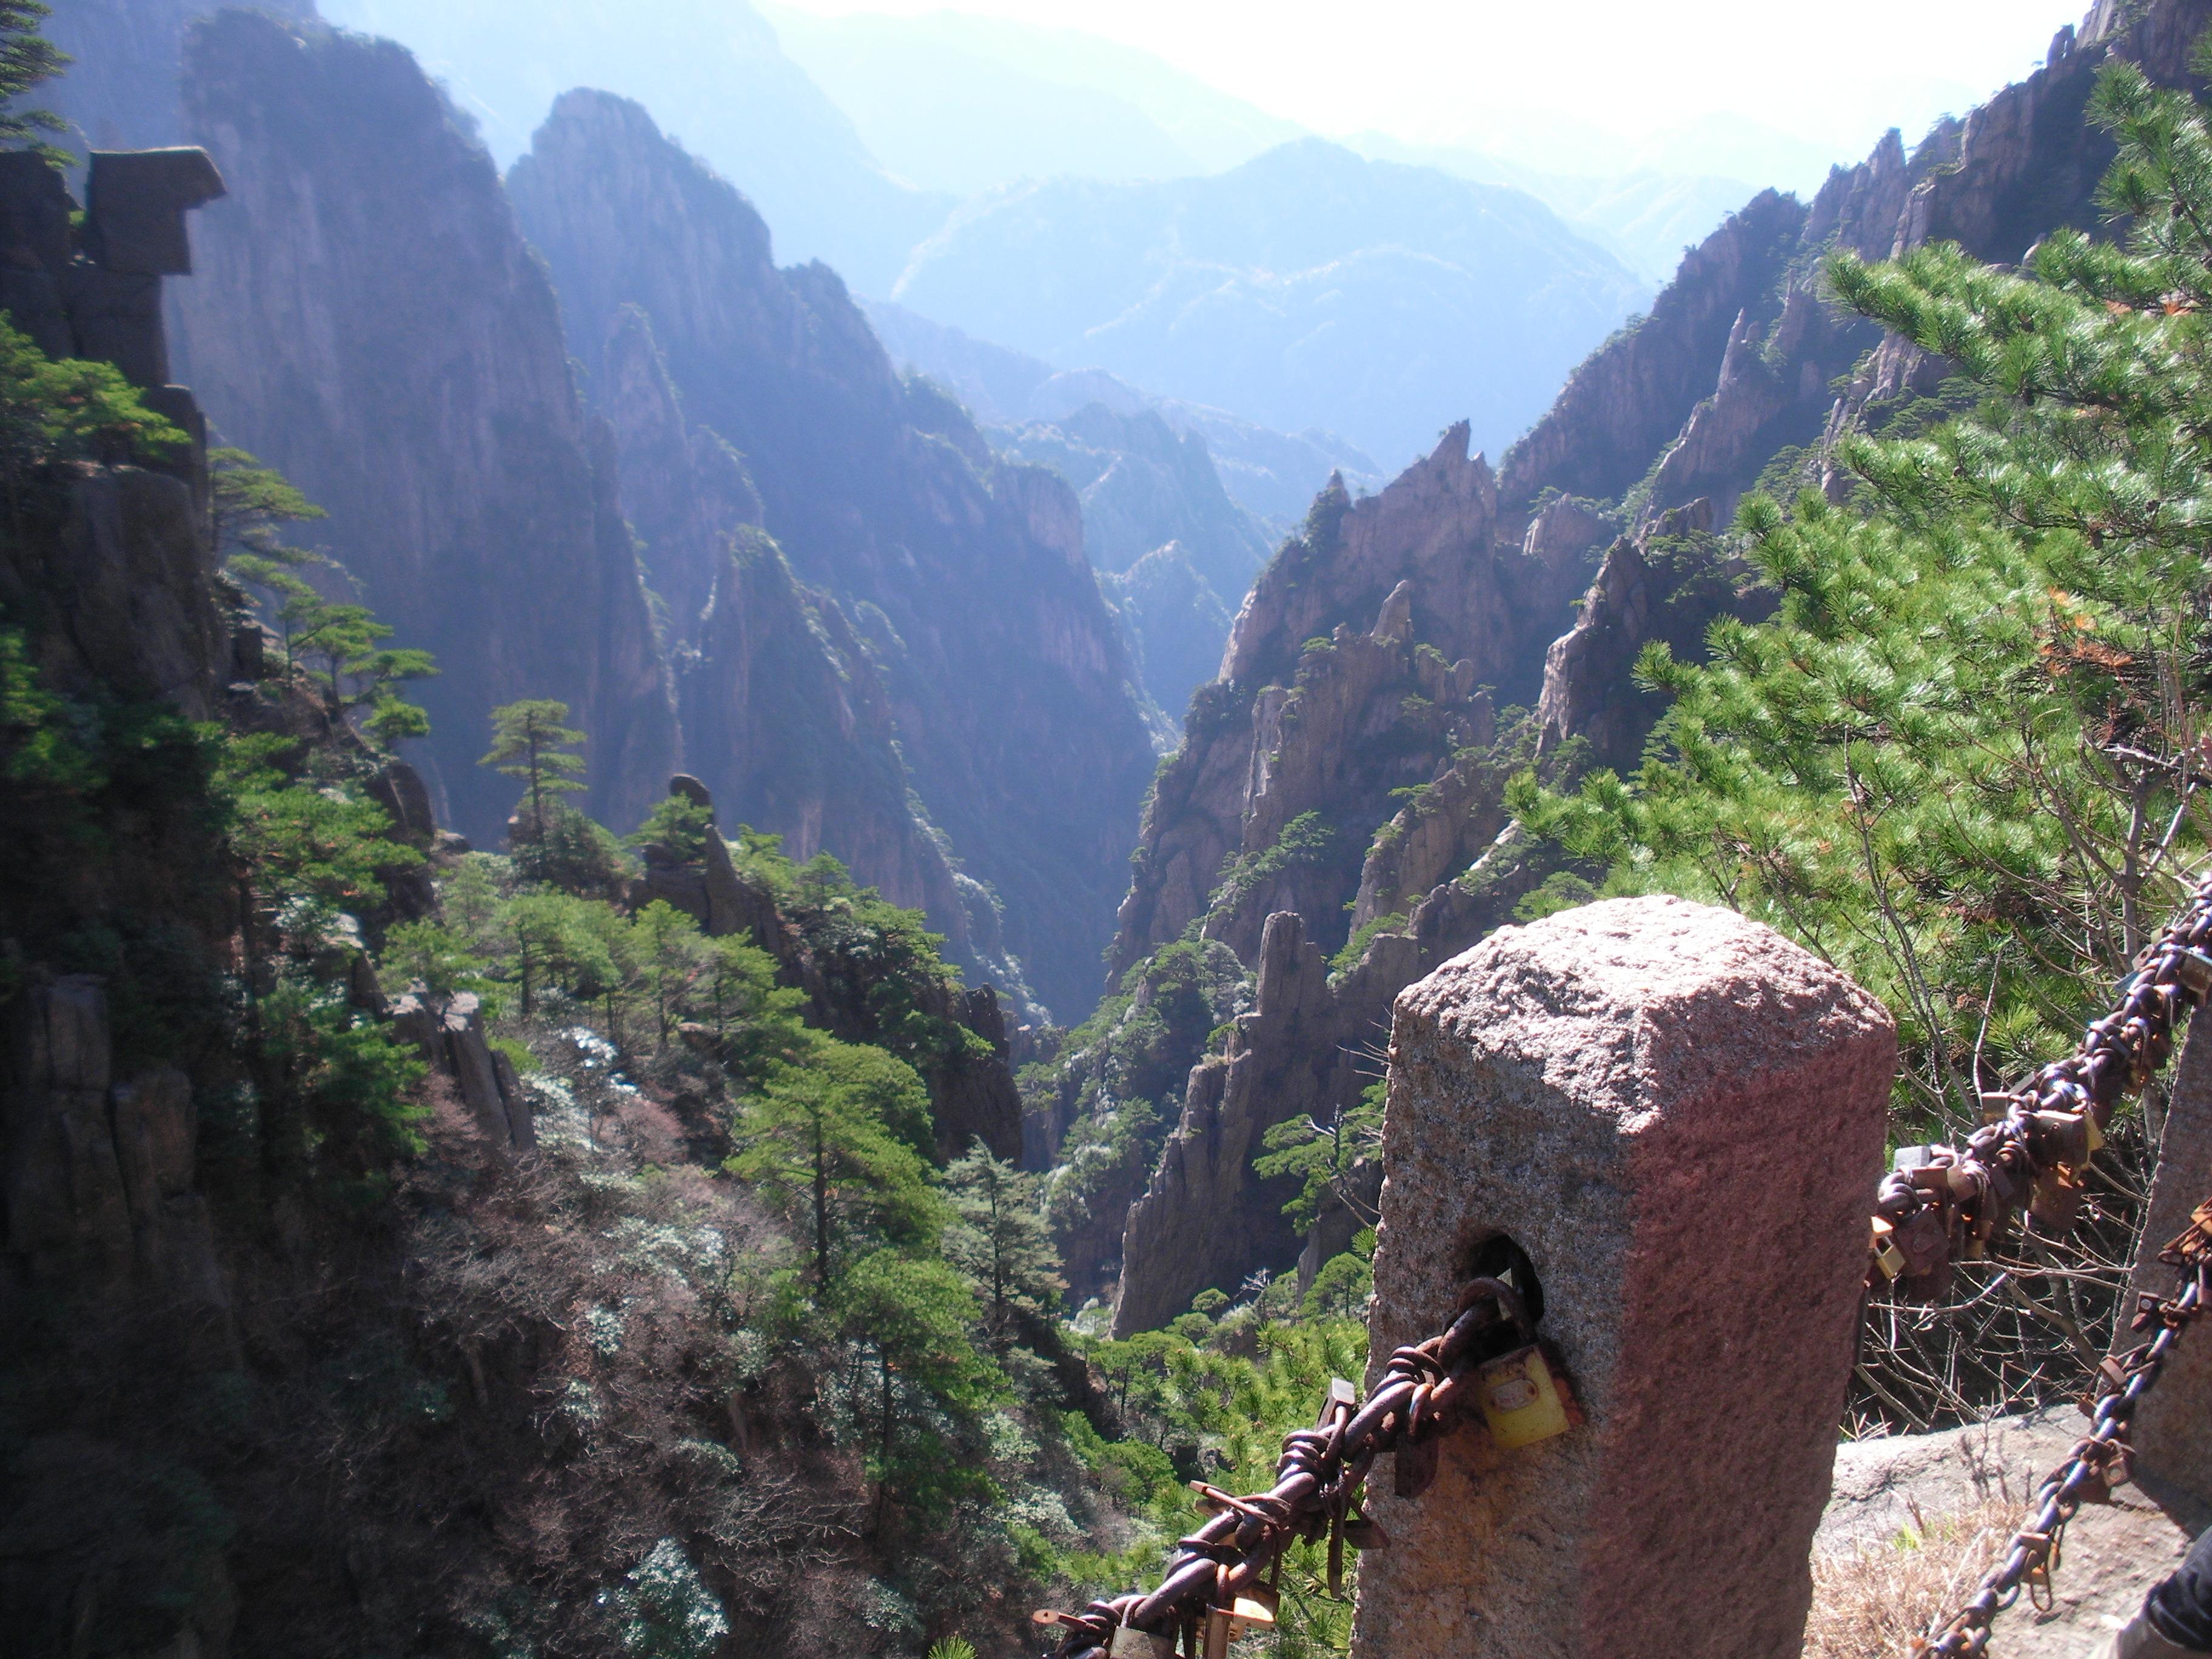 File:China Anhui Huang Shan scenic view 16.JPG - Wikimedia ...